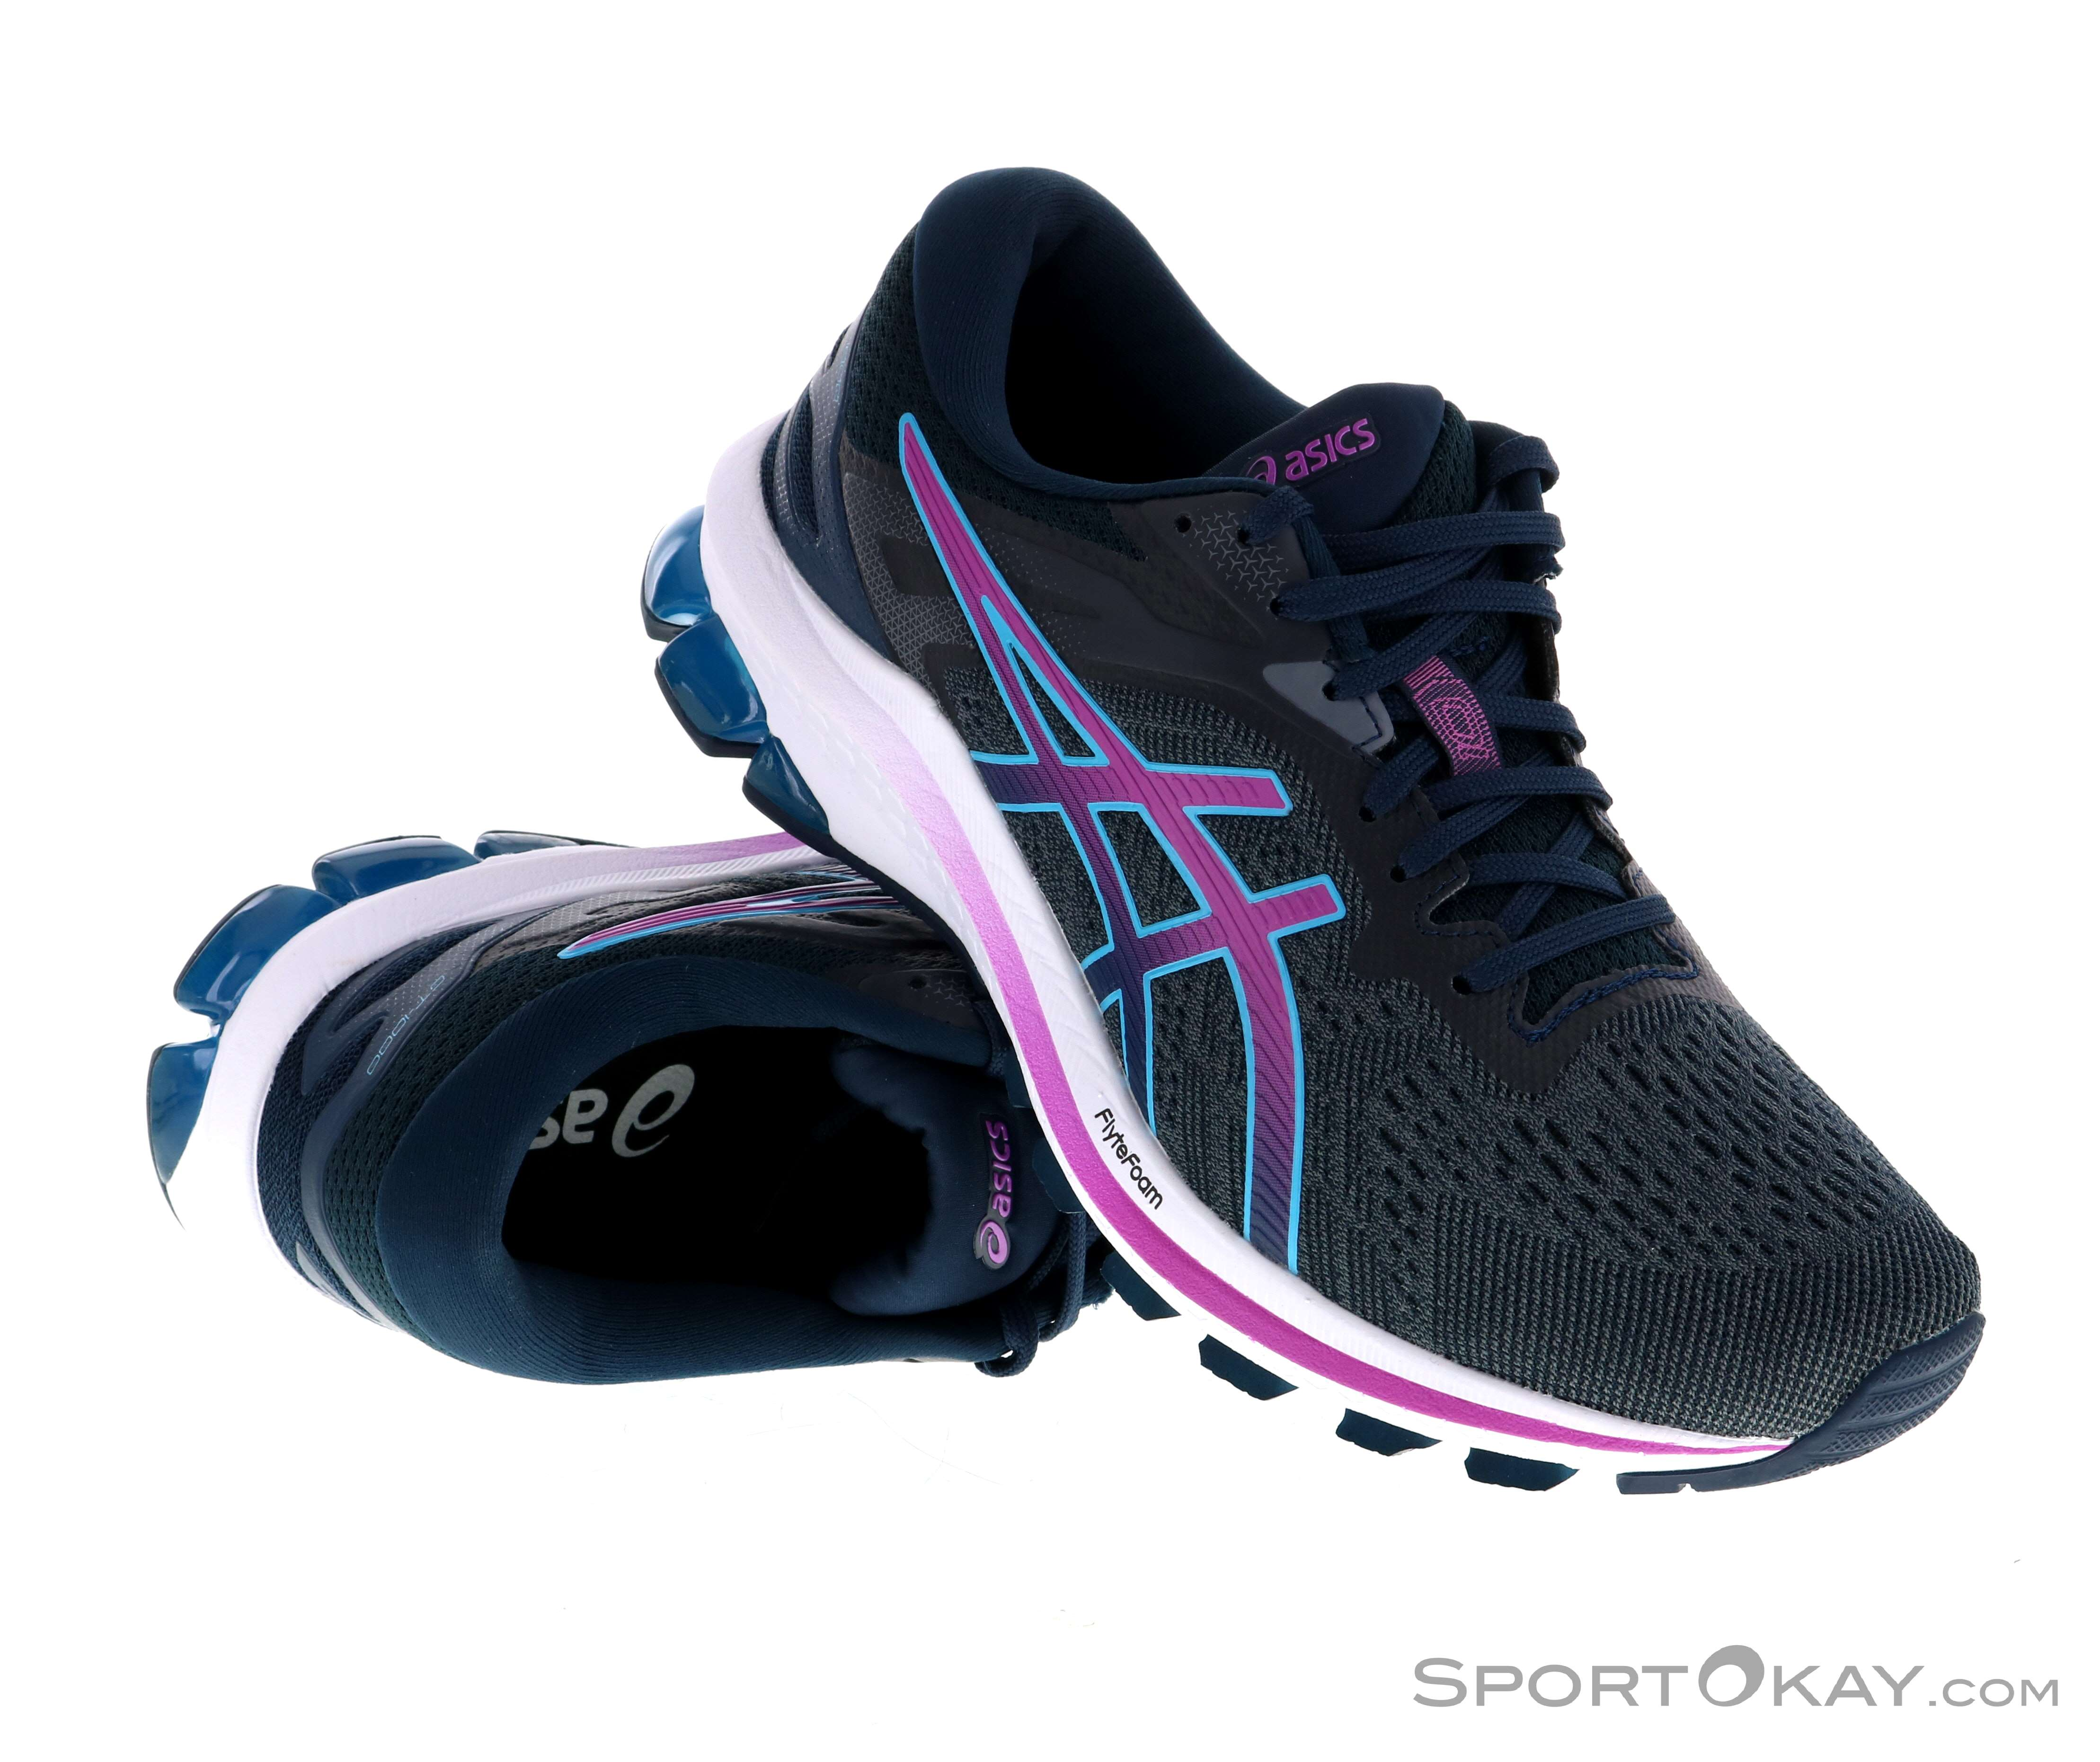 Asics Asics GT-1000 10 Womens Running Shoes